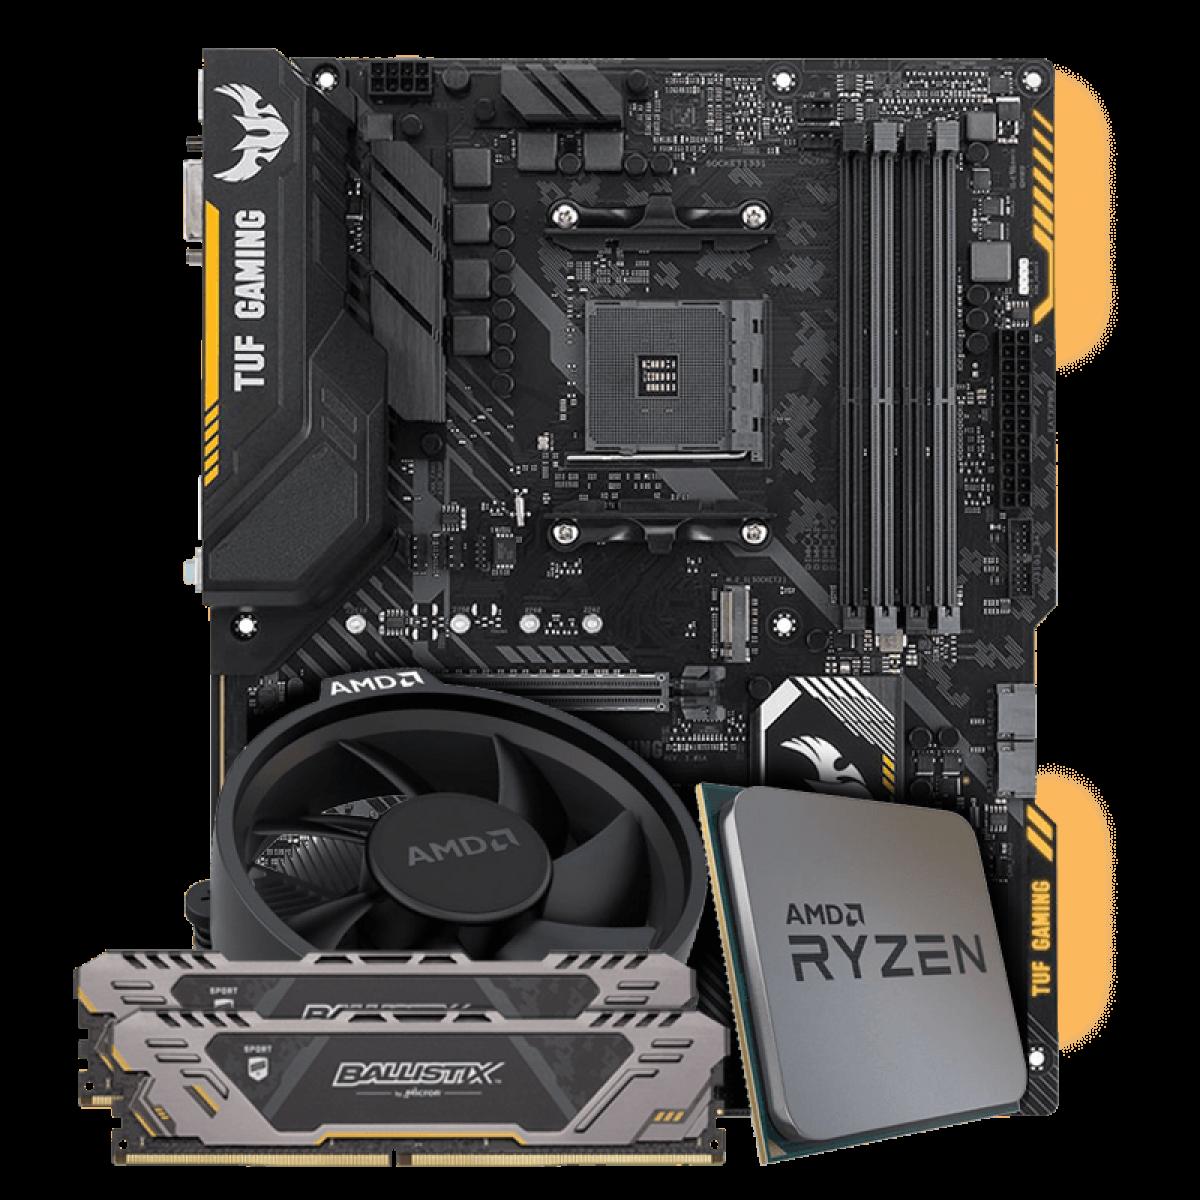 Kit Upgrade Placa Mãe Asus TUF X470-Plus Gaming DDR4 + Processador AMD Ryzen 5 2600X 3.6GHz + Memória DDR4 Crucial Ballistix Sport TUF Edition 16GB (2X8GB) 3000MHz